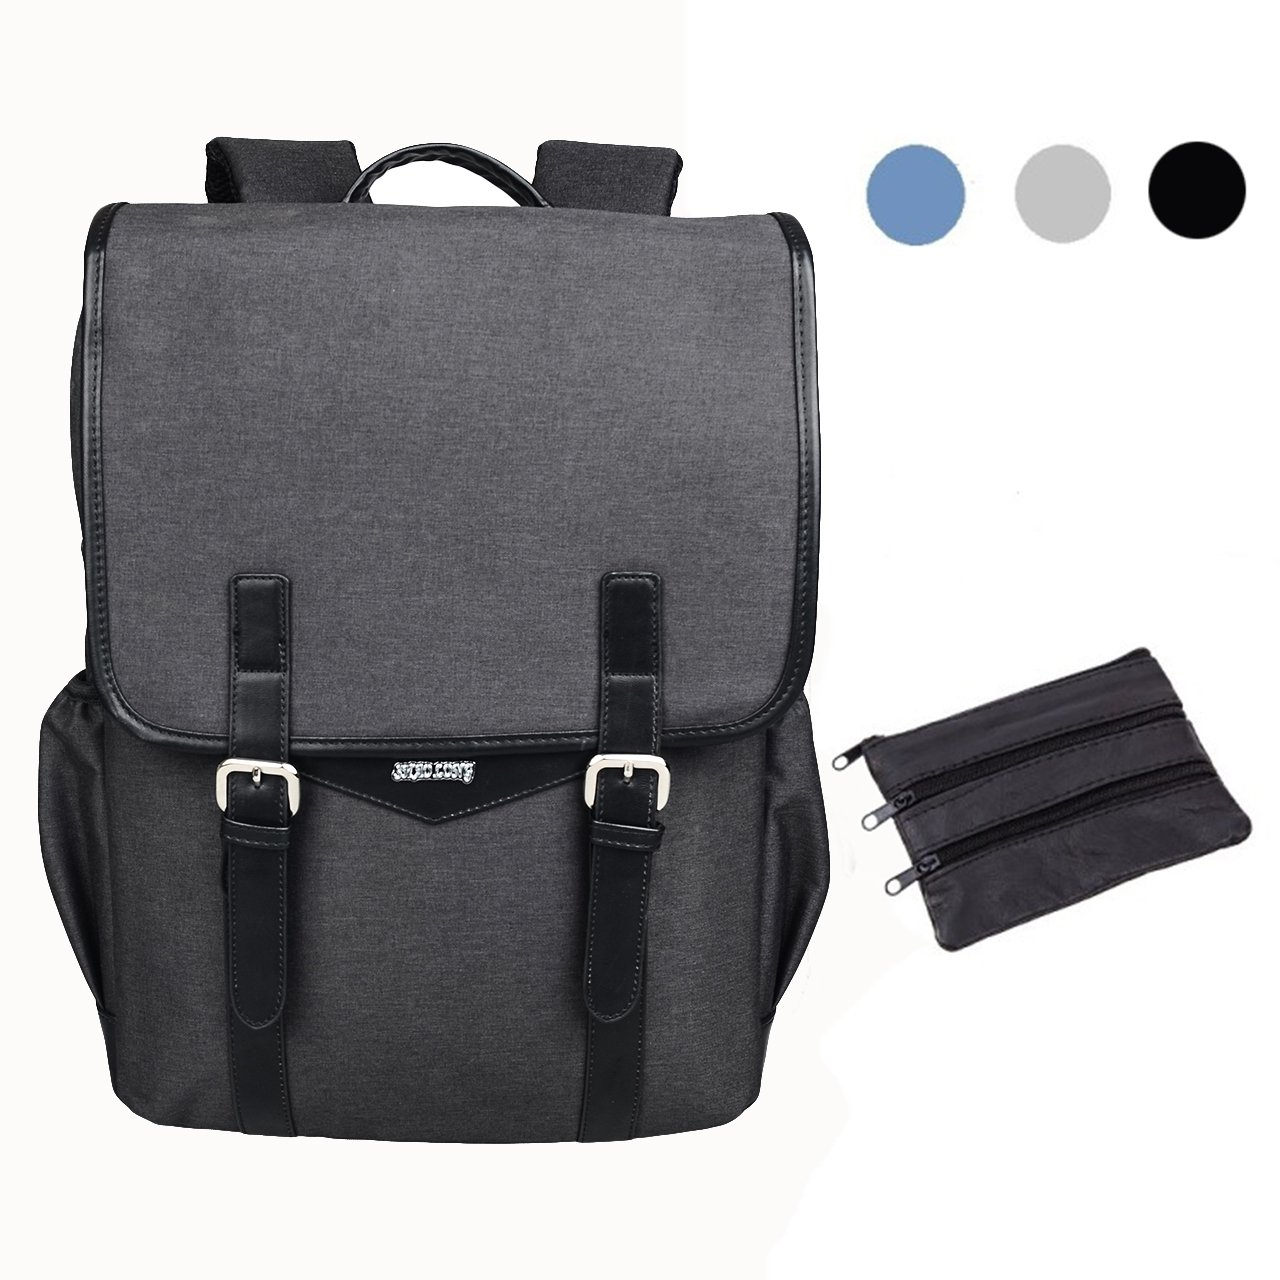 SHAOLONG Canvas Water Repellent Laptop Backpack 15.6 Inch Computer Bag Business Bag School Backpack Traveling Backpack Black